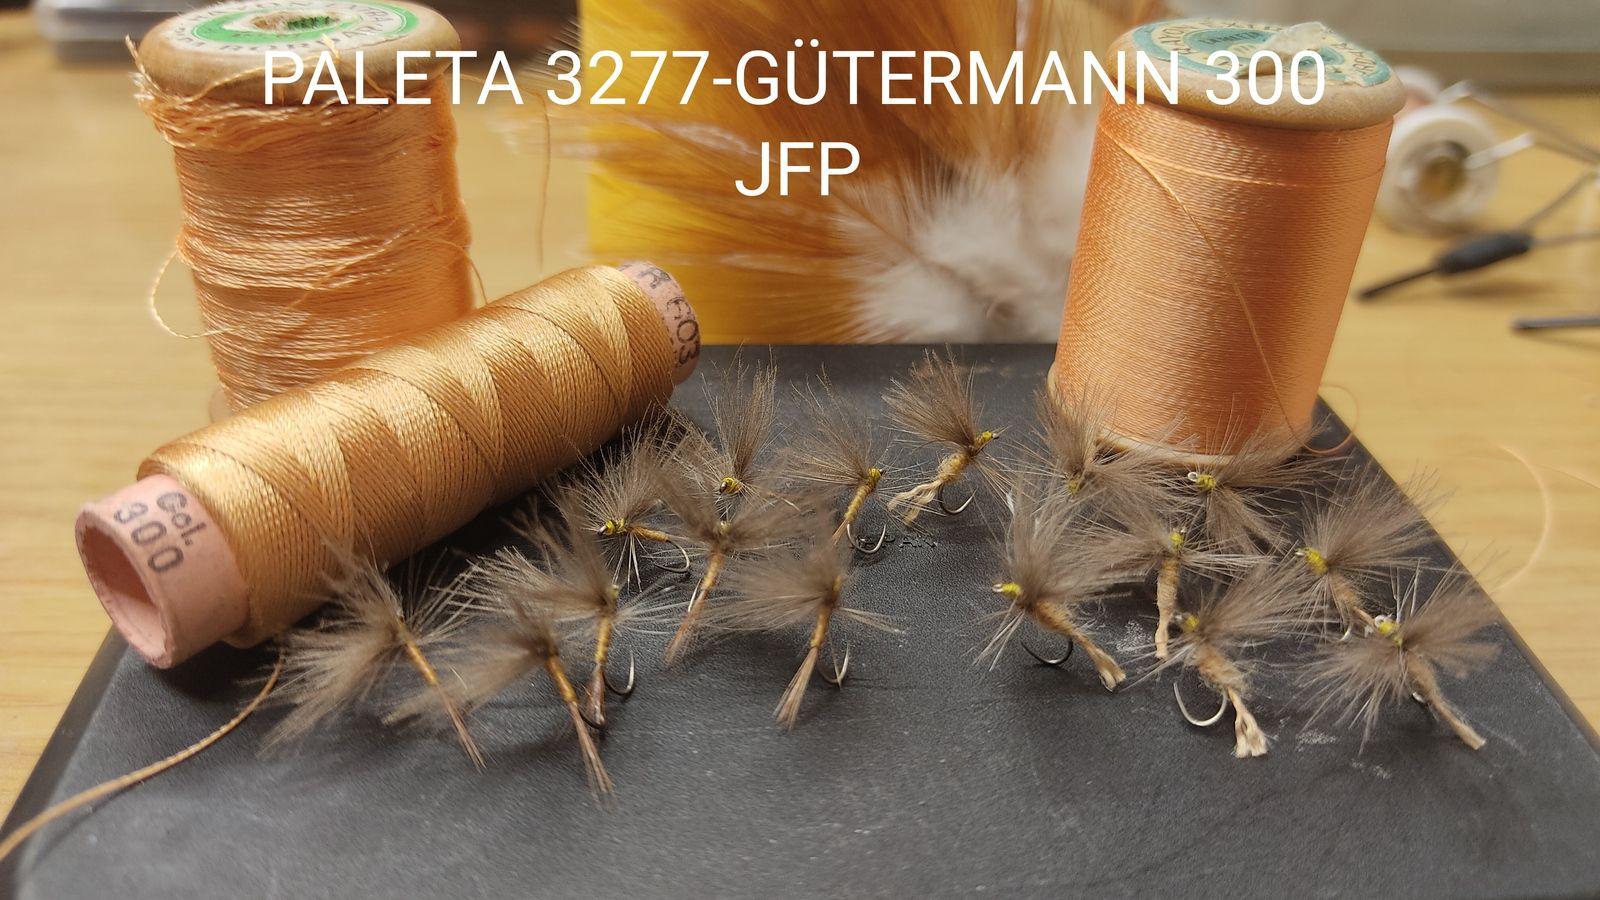 PALETA 3277-GÜTERMANN 300/JFP